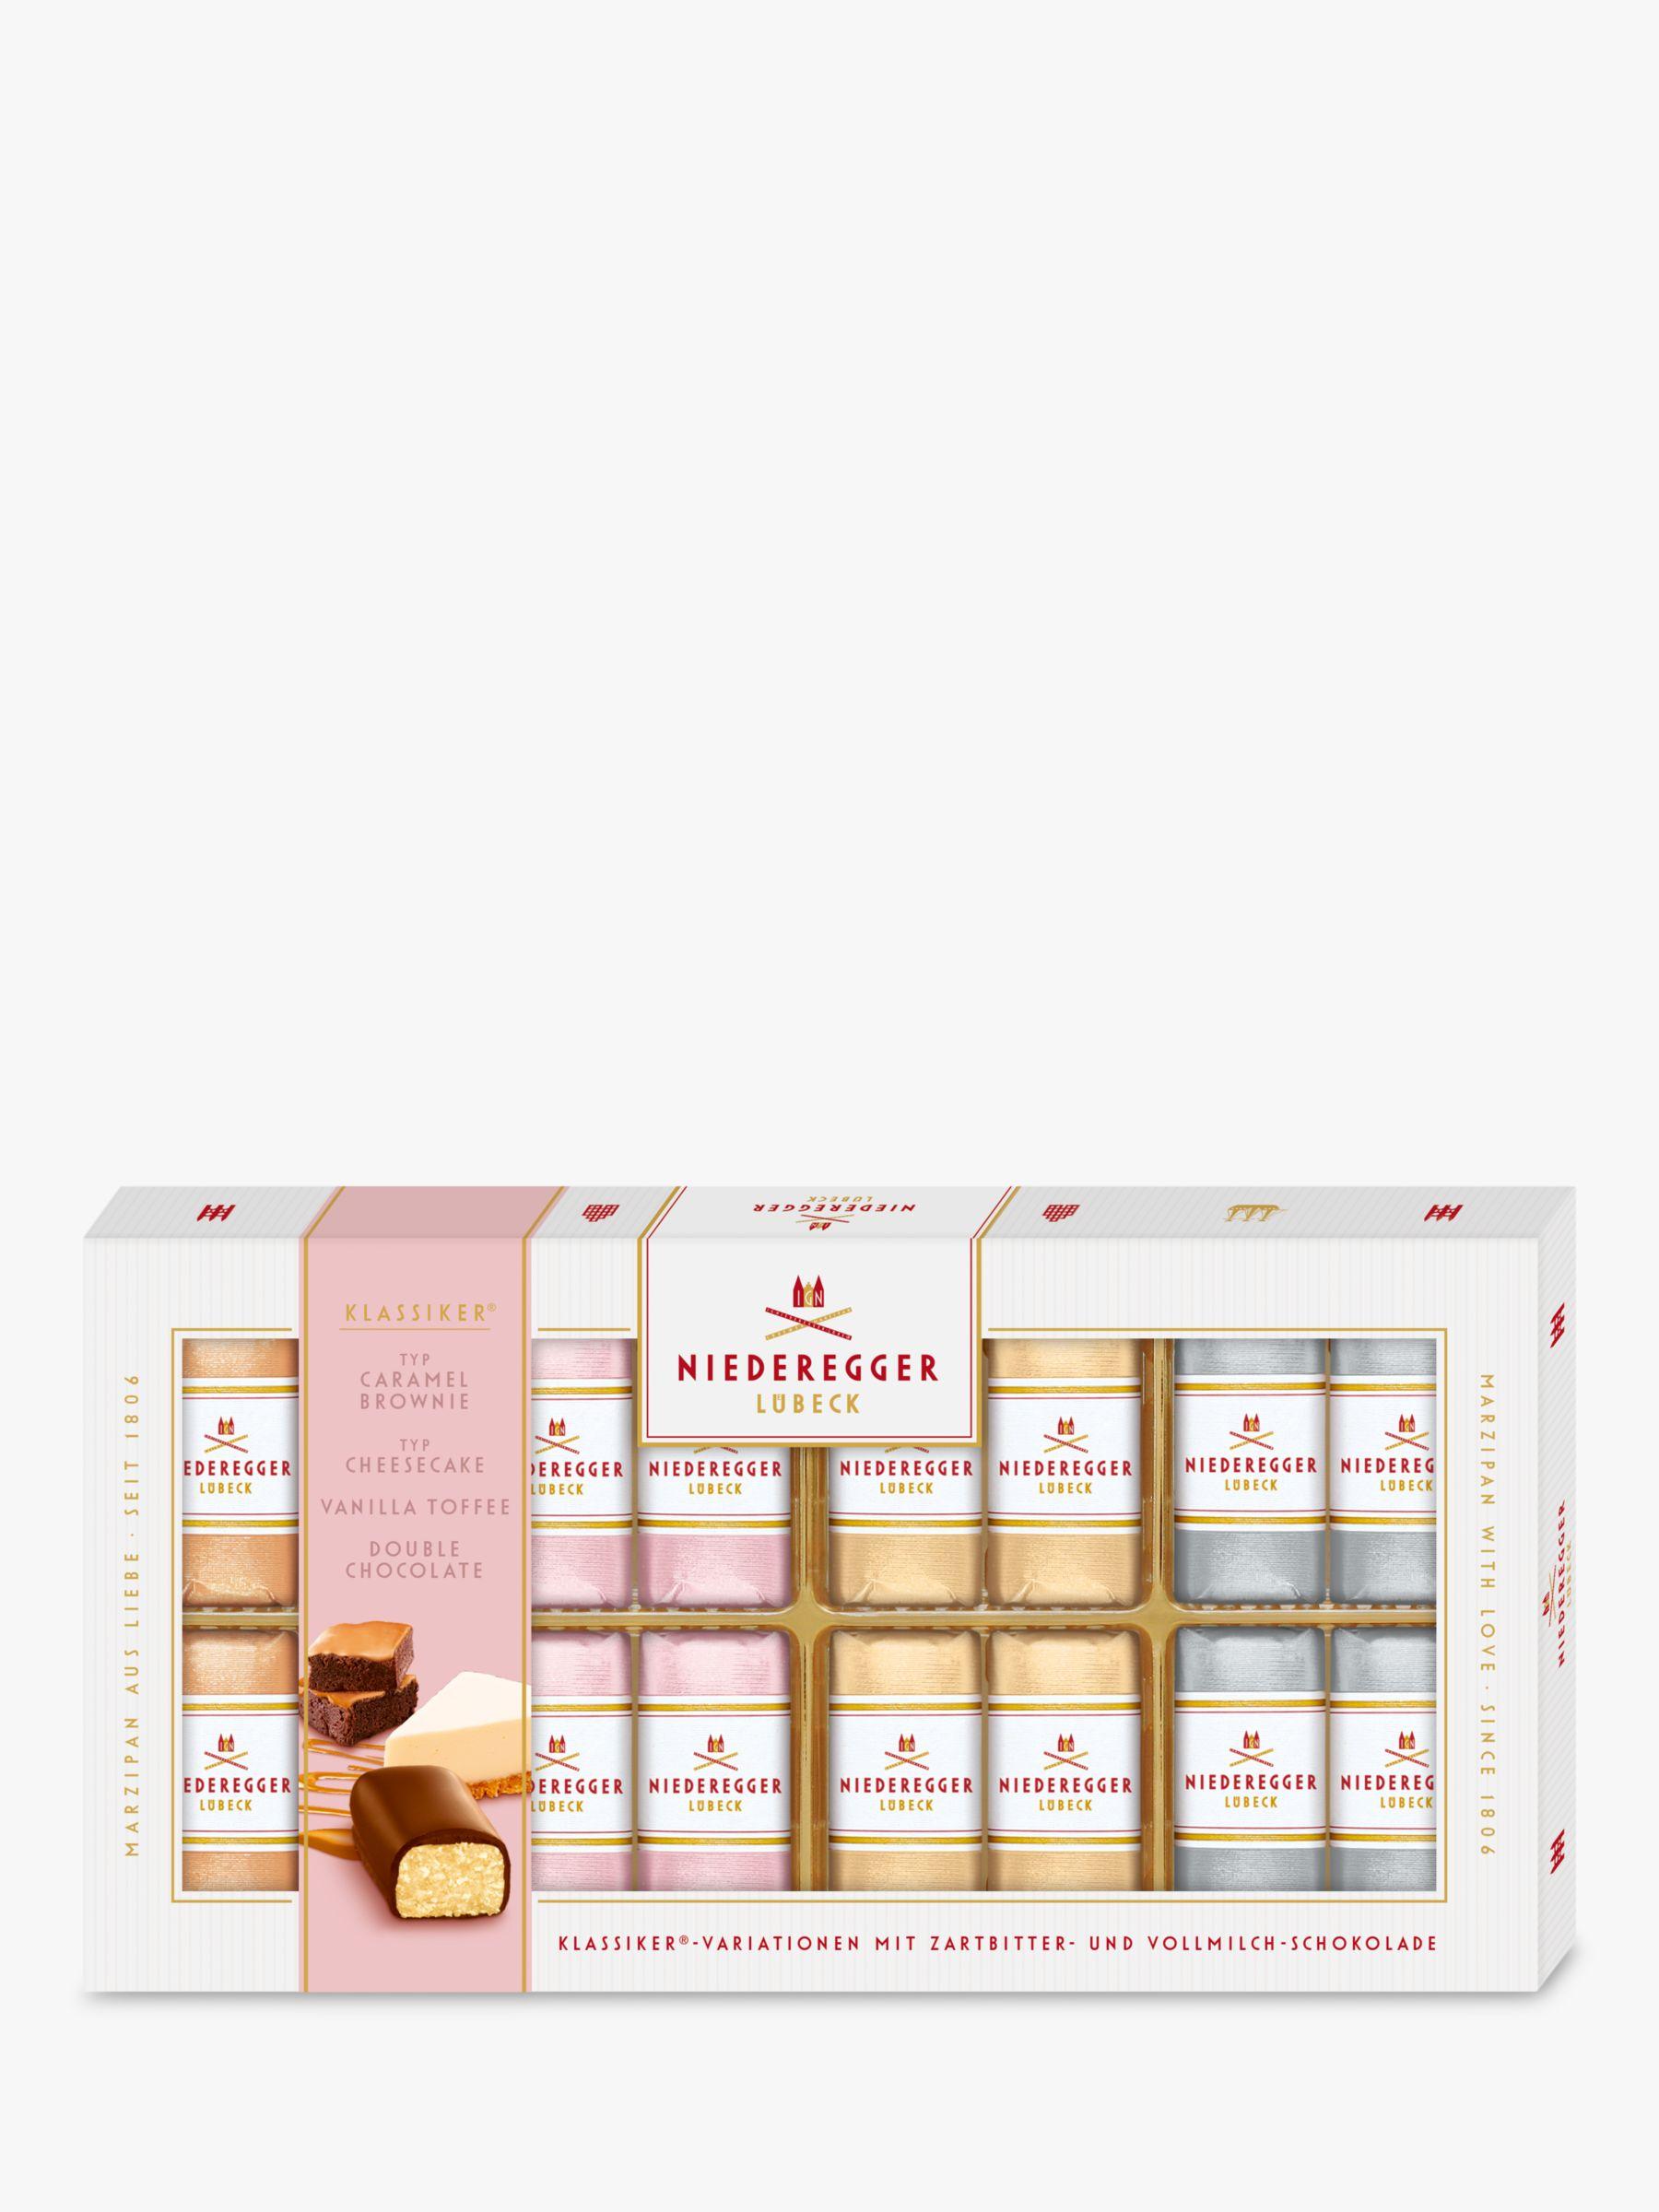 Niederegger Niederegger Marzipan Desserts Edition Gift Box, 200g